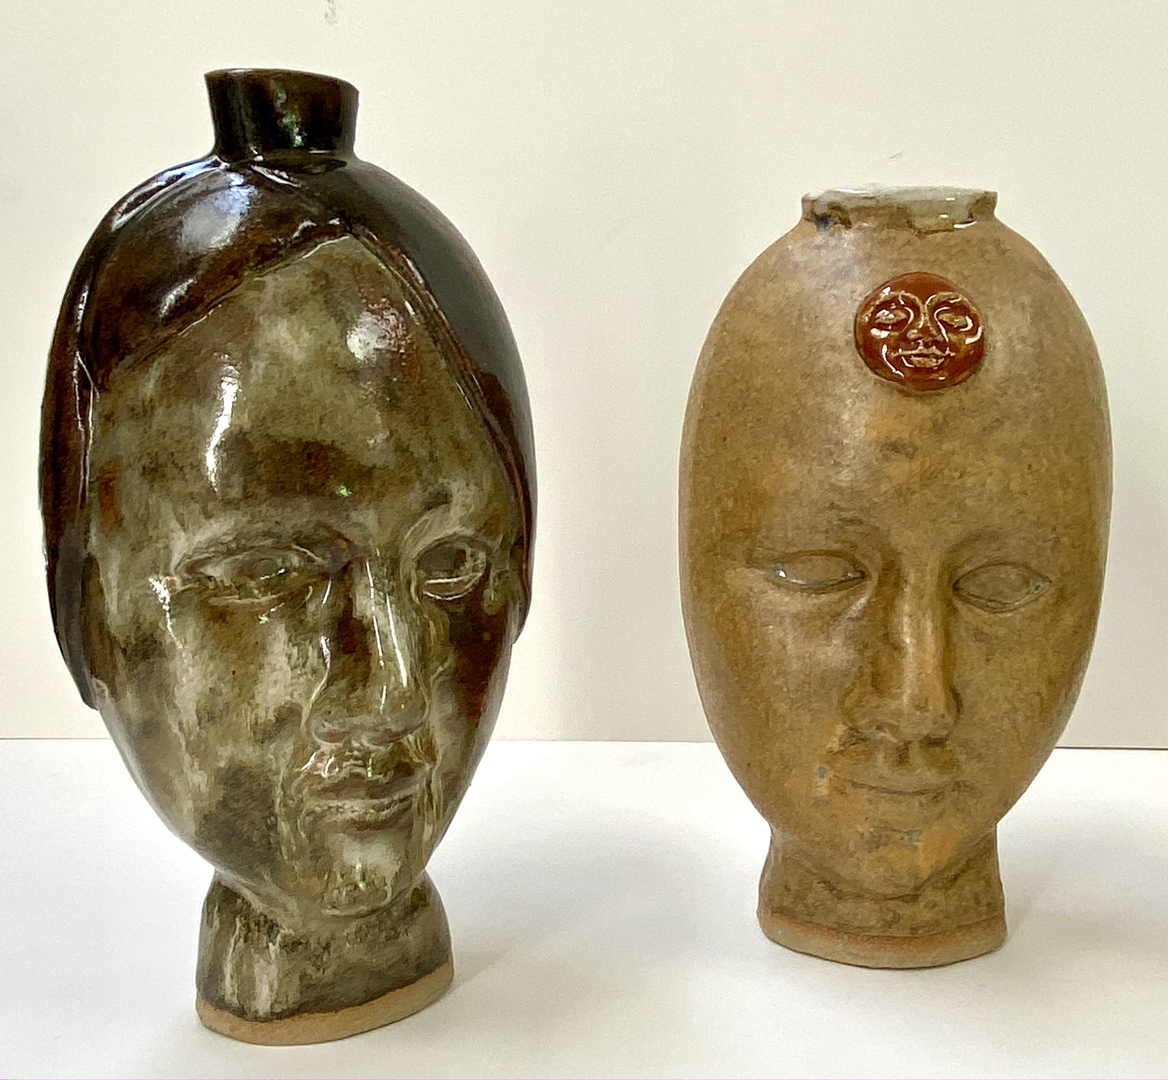 Janus Vessels